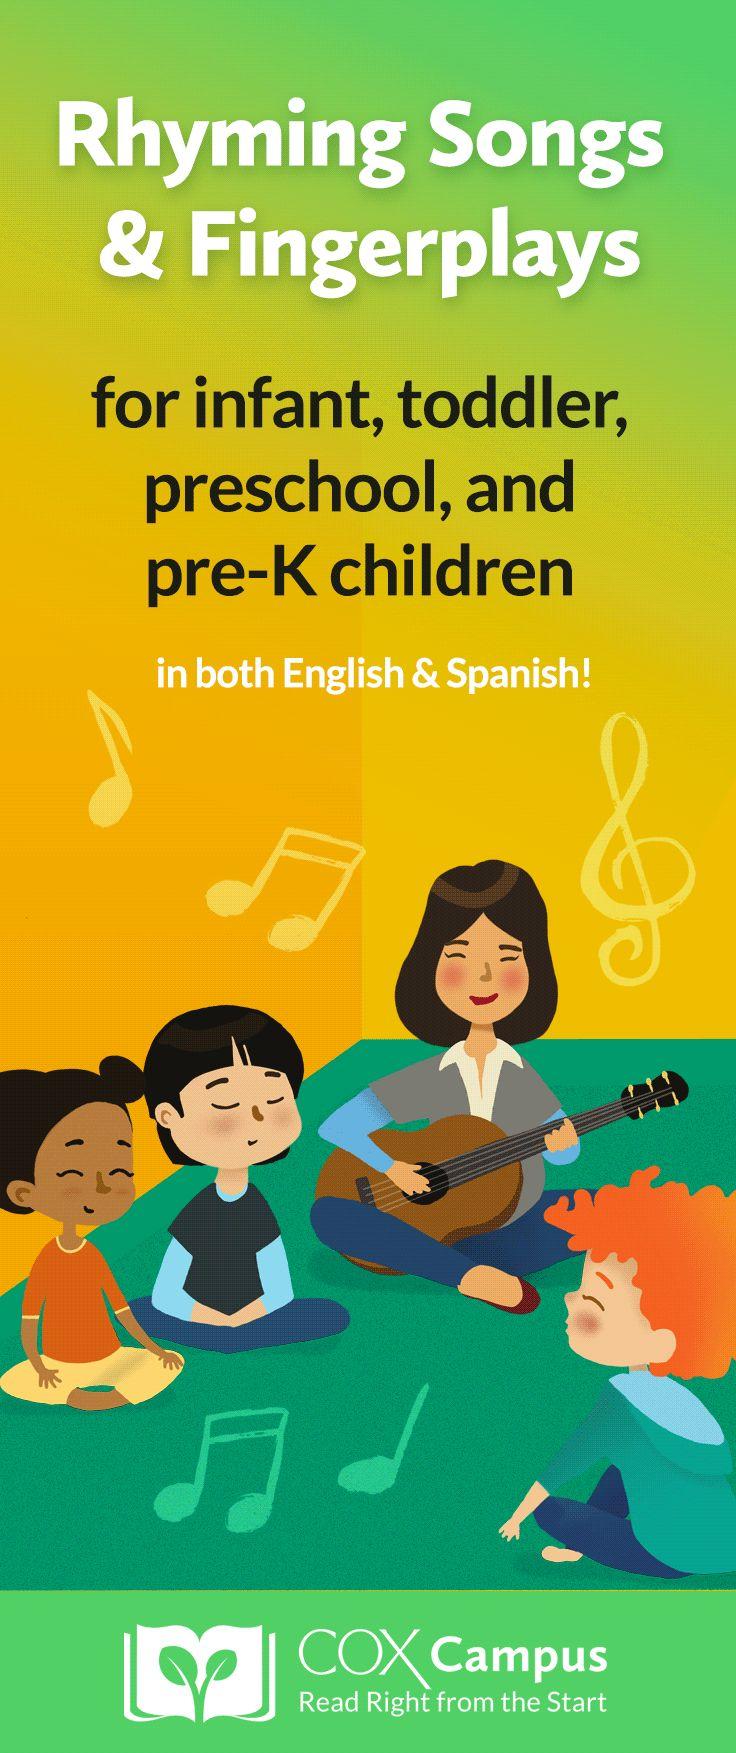 75+ Rhyming Songs & Fingerplays in English & Spanish